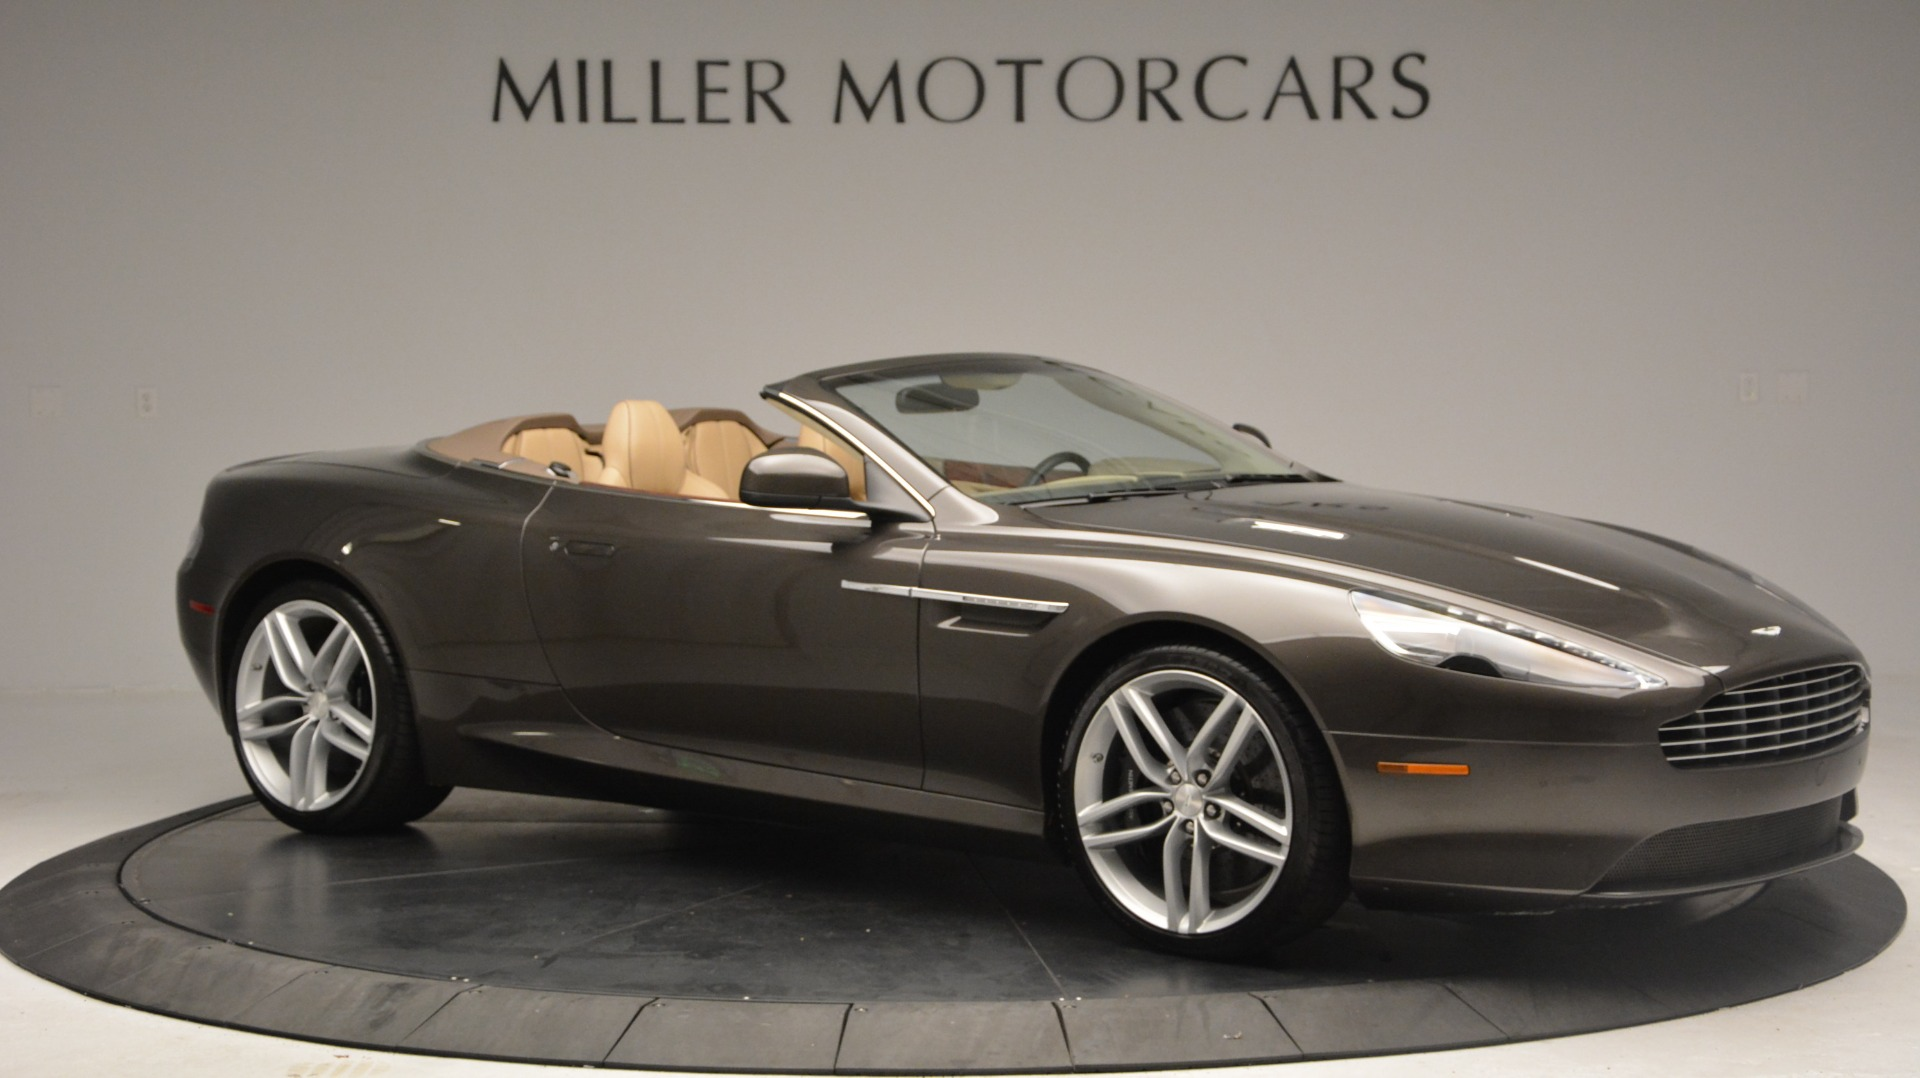 Used 2012 Aston Martin Virage Convertible For Sale In Greenwich, CT. Alfa Romeo of Greenwich, 7613 3351_p10